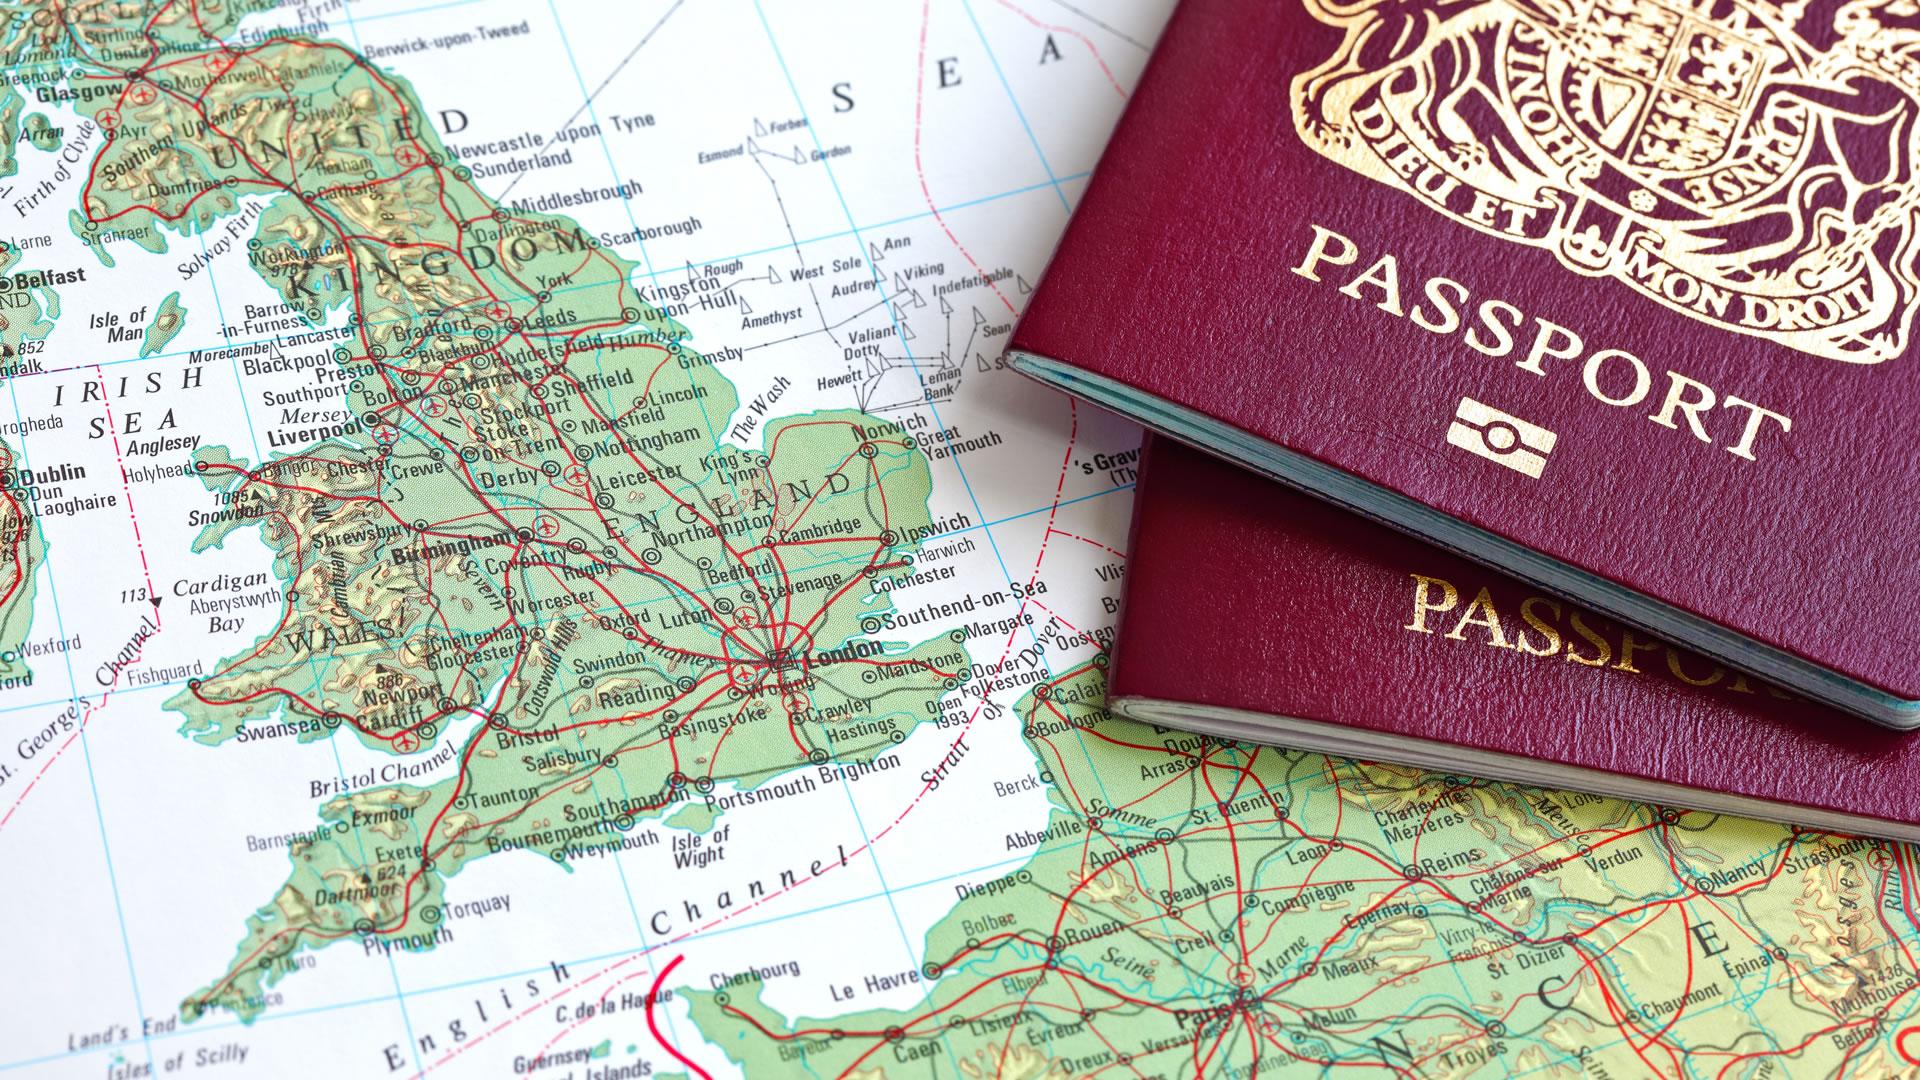 Italia exigirá a los turistas pasaporte sanitario para evitar que ingresen con coronavirus